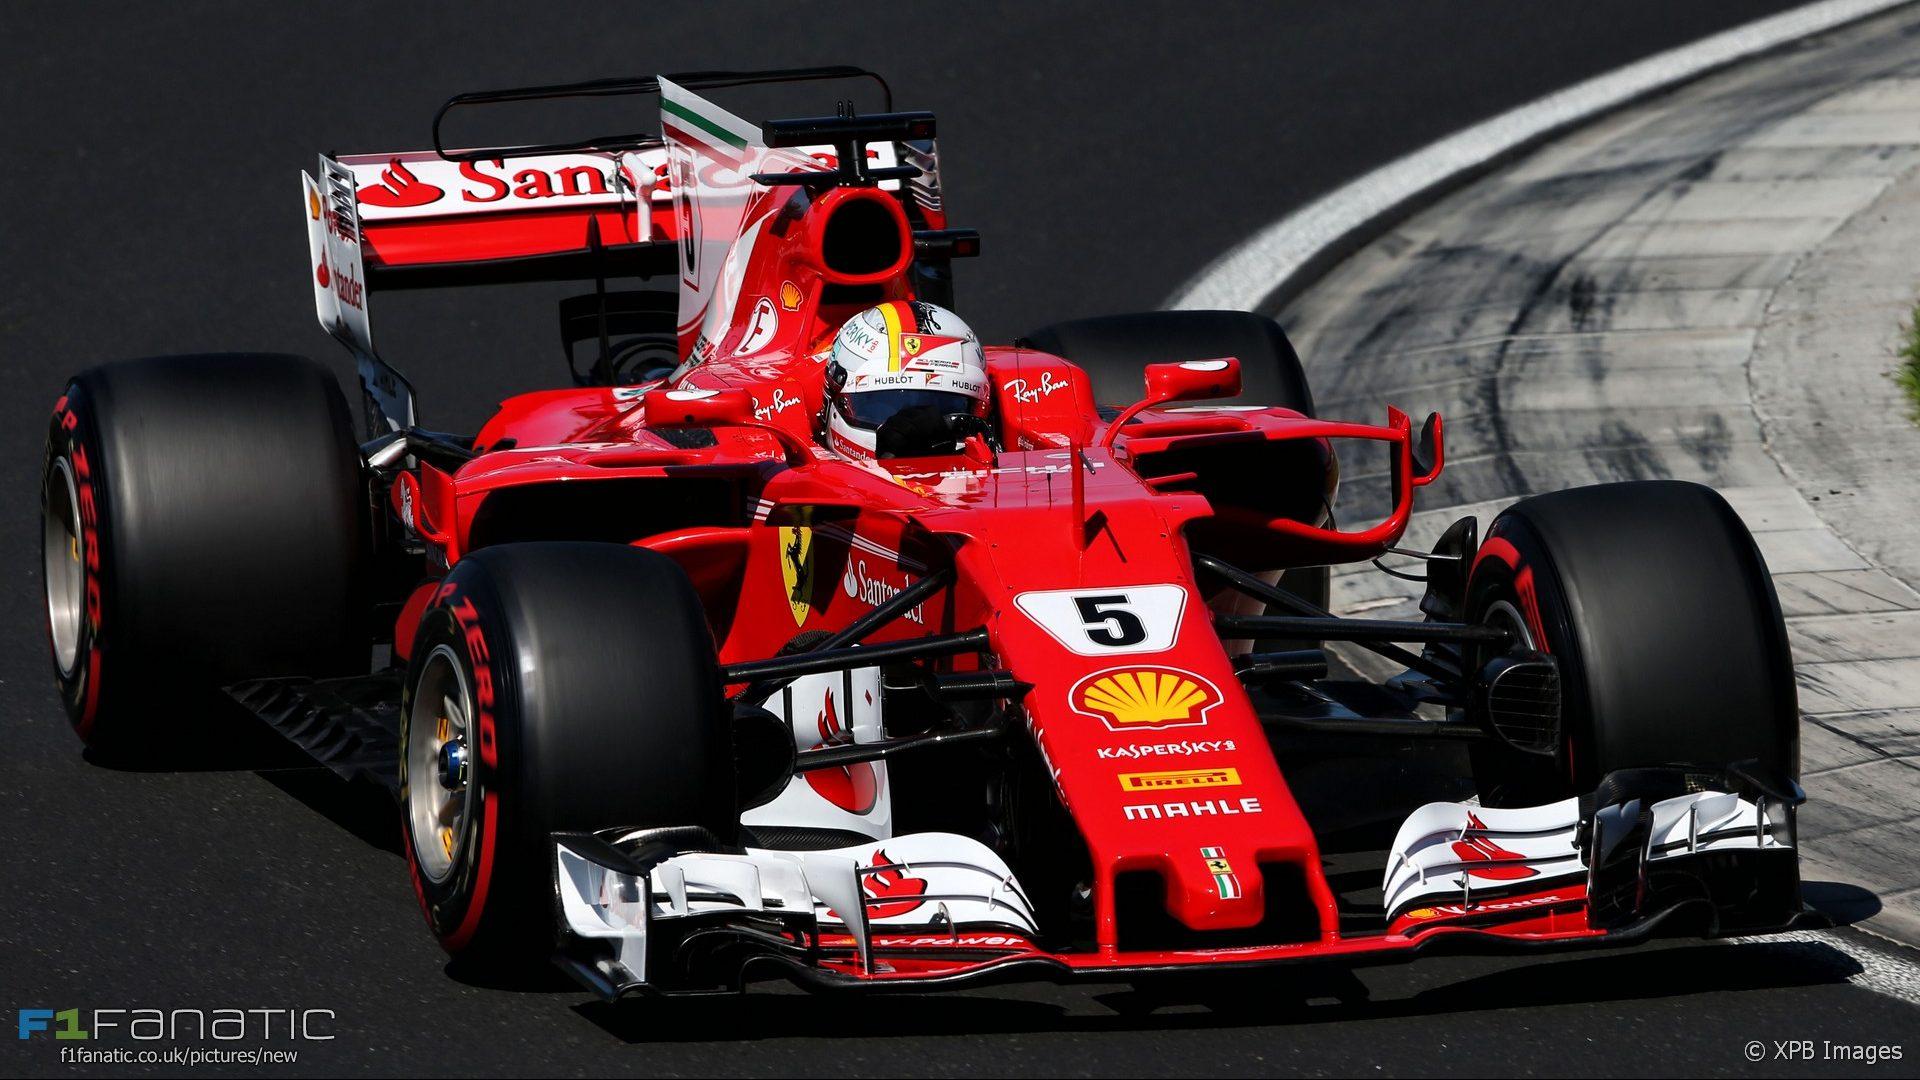 Criminal Girls Wallpaper 1920 Sebastian Vettel Ferrari Hungaroring 2017 183 F1 Fanatic